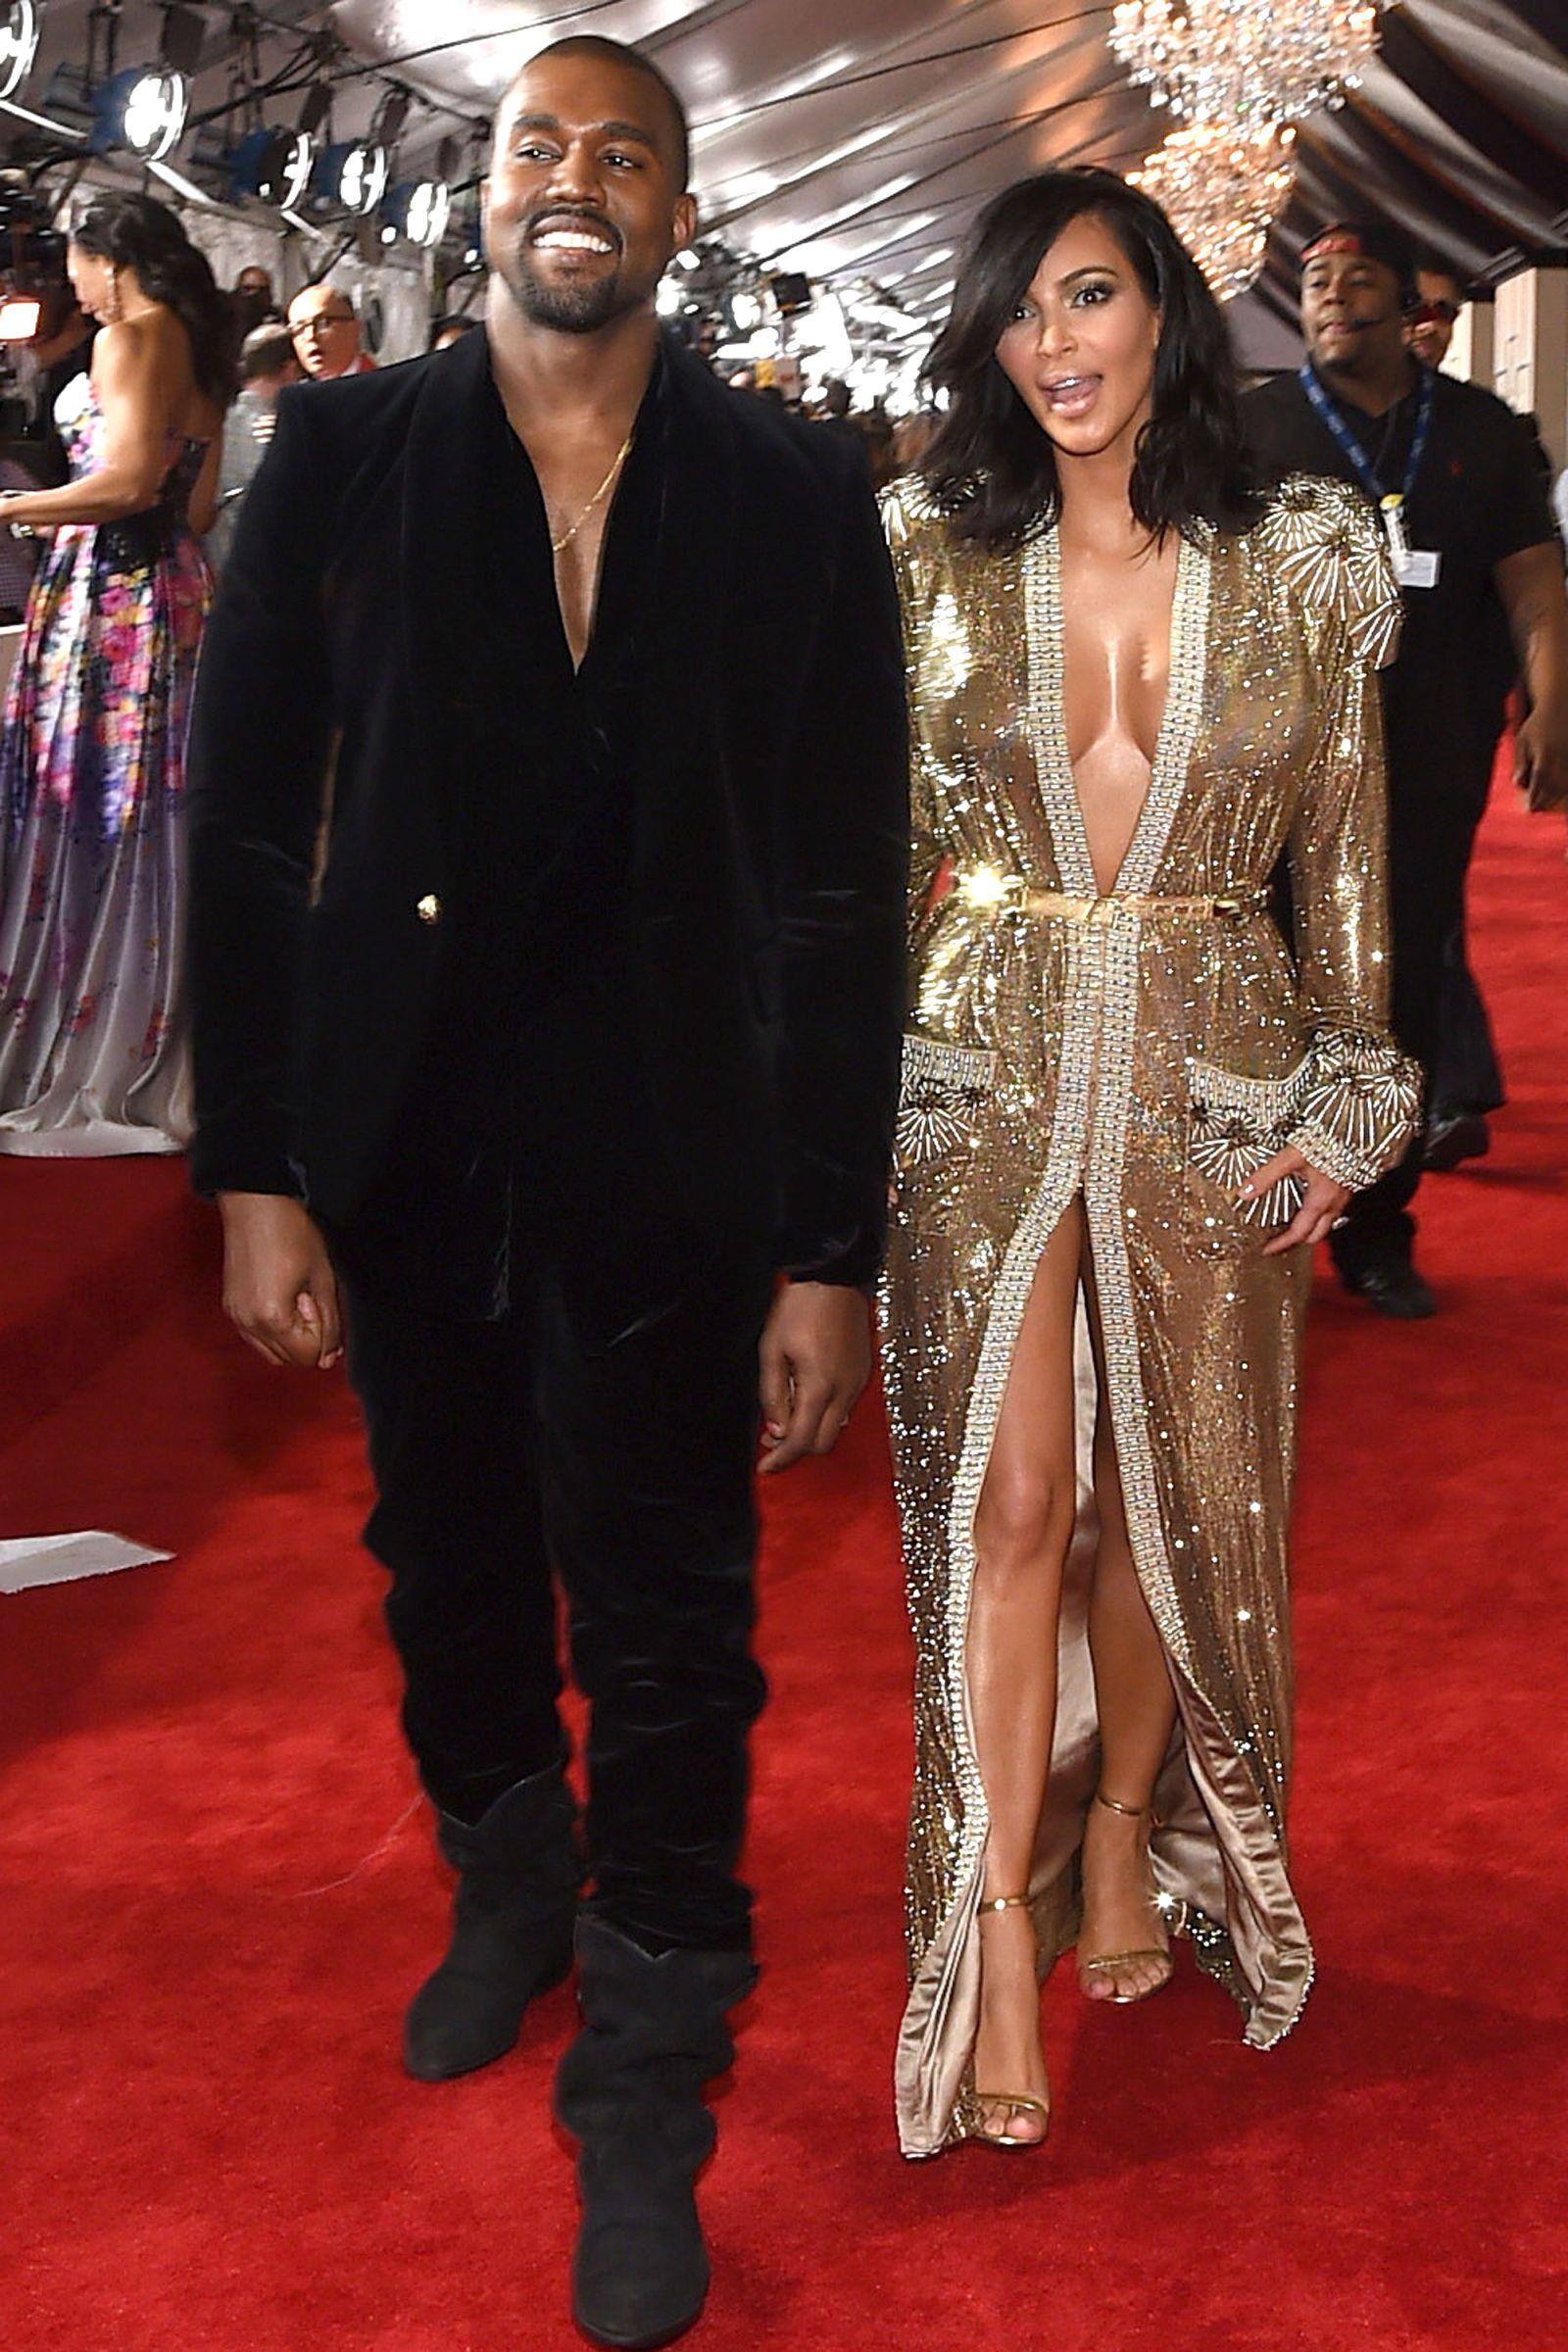 10 Times Kim Kardashian And Kanye West Were Adorably In Love At The Grammys Kim Kardashian Kanye Fashion Kim Kardashian